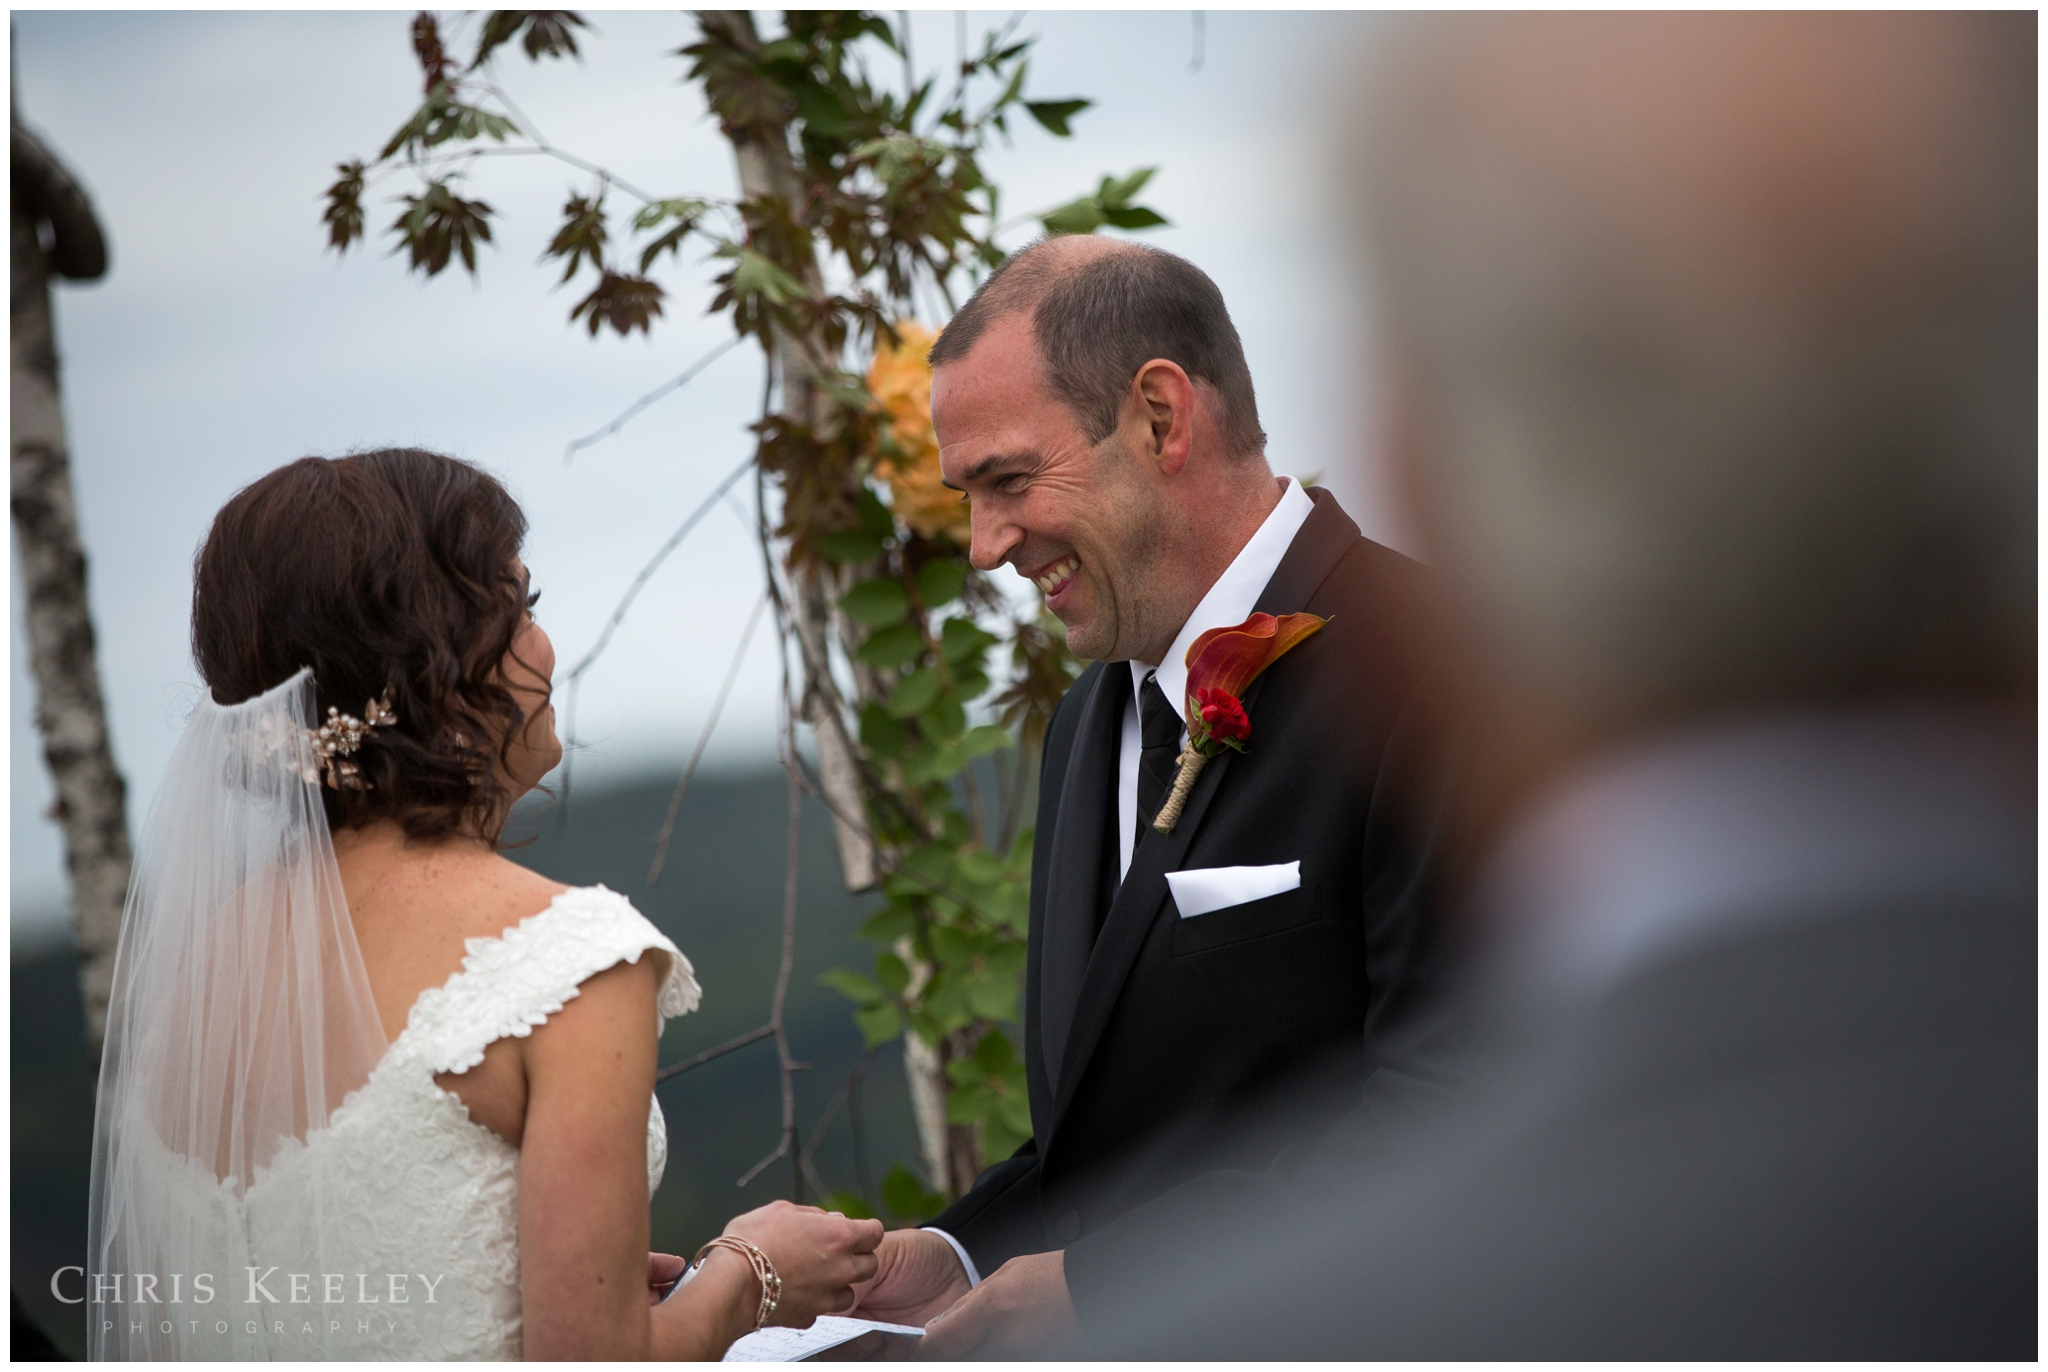 18-birch-hill-farm-new-hampshire-wedding-photographer-chris-keeley-photography.jpg